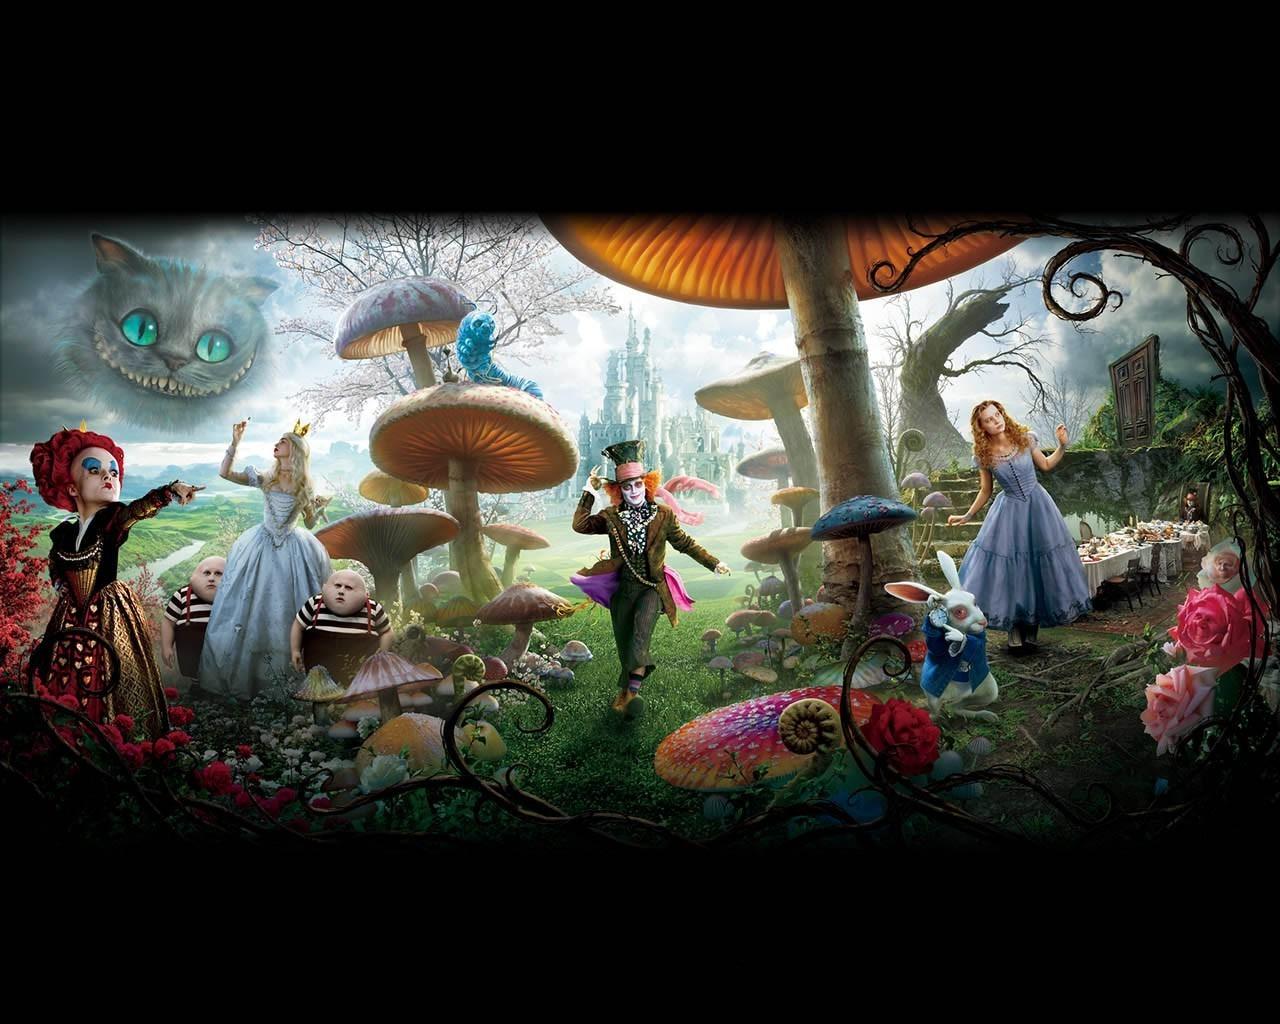 Alice In Wonderland Disney Wallpaper 1280x1024